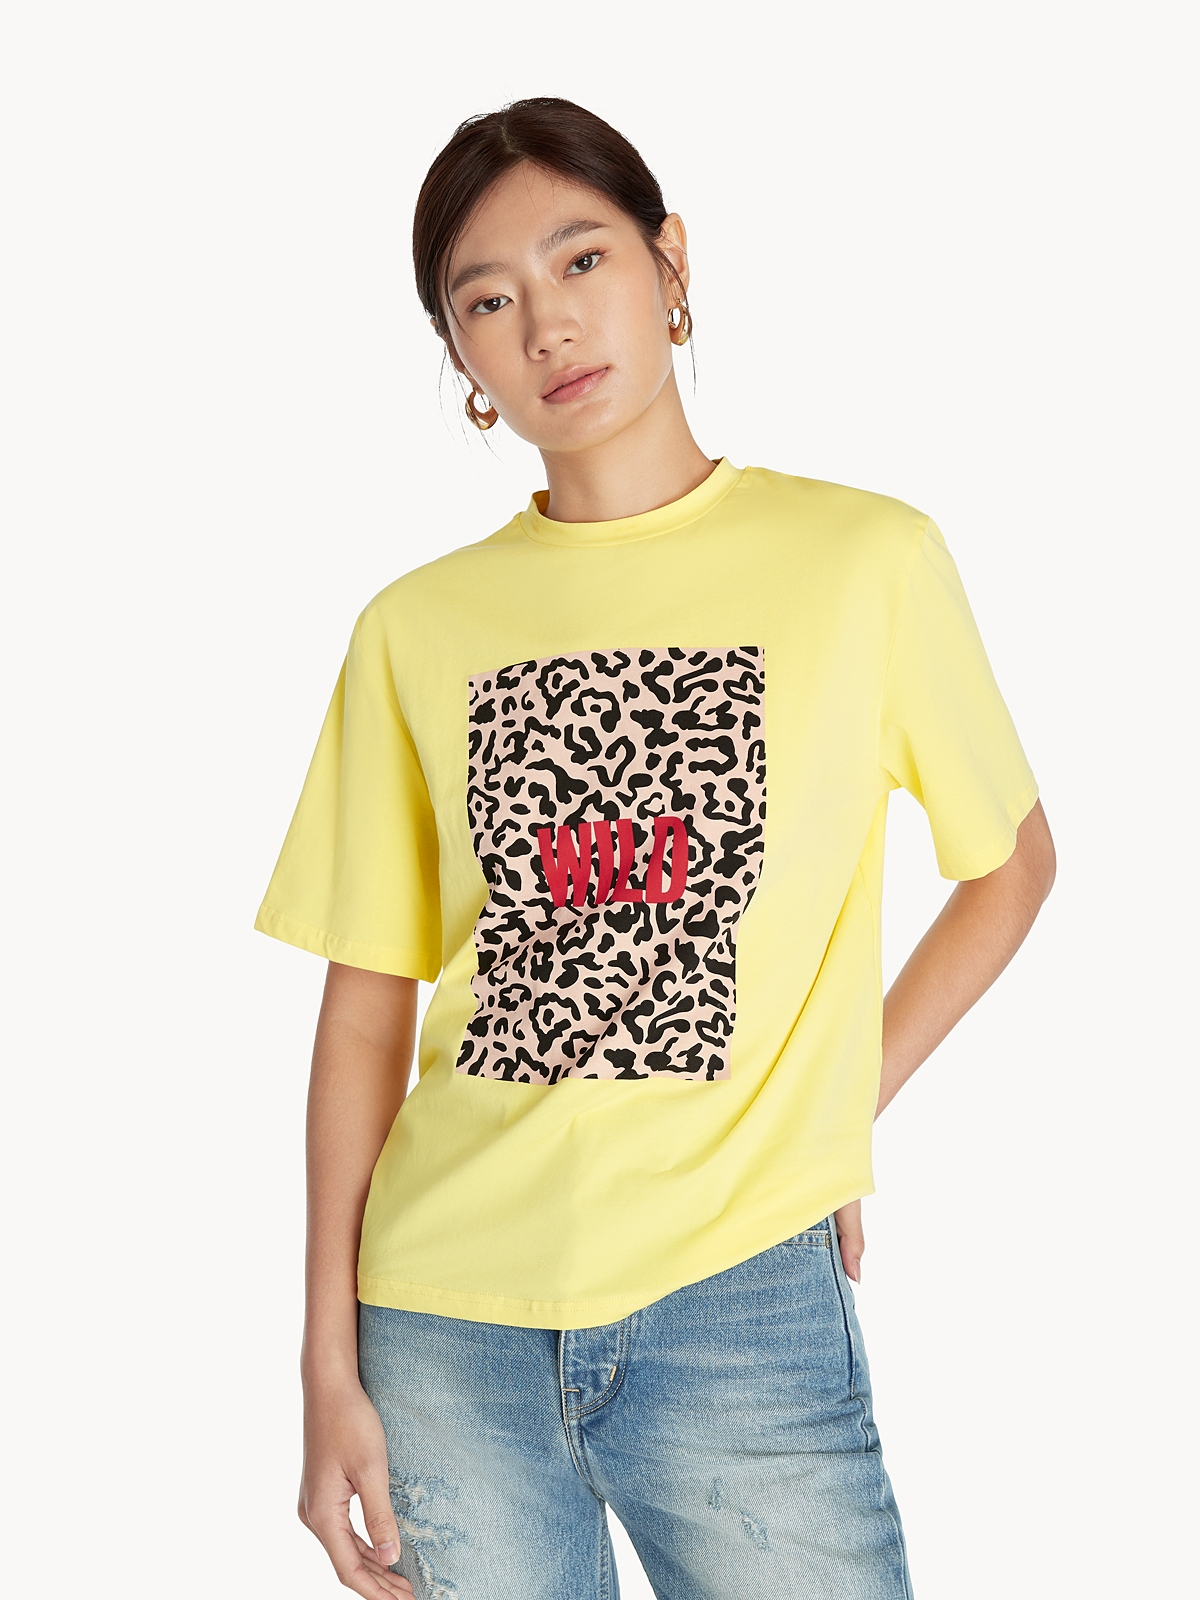 Wild Leopard Graphic Tee Yellow